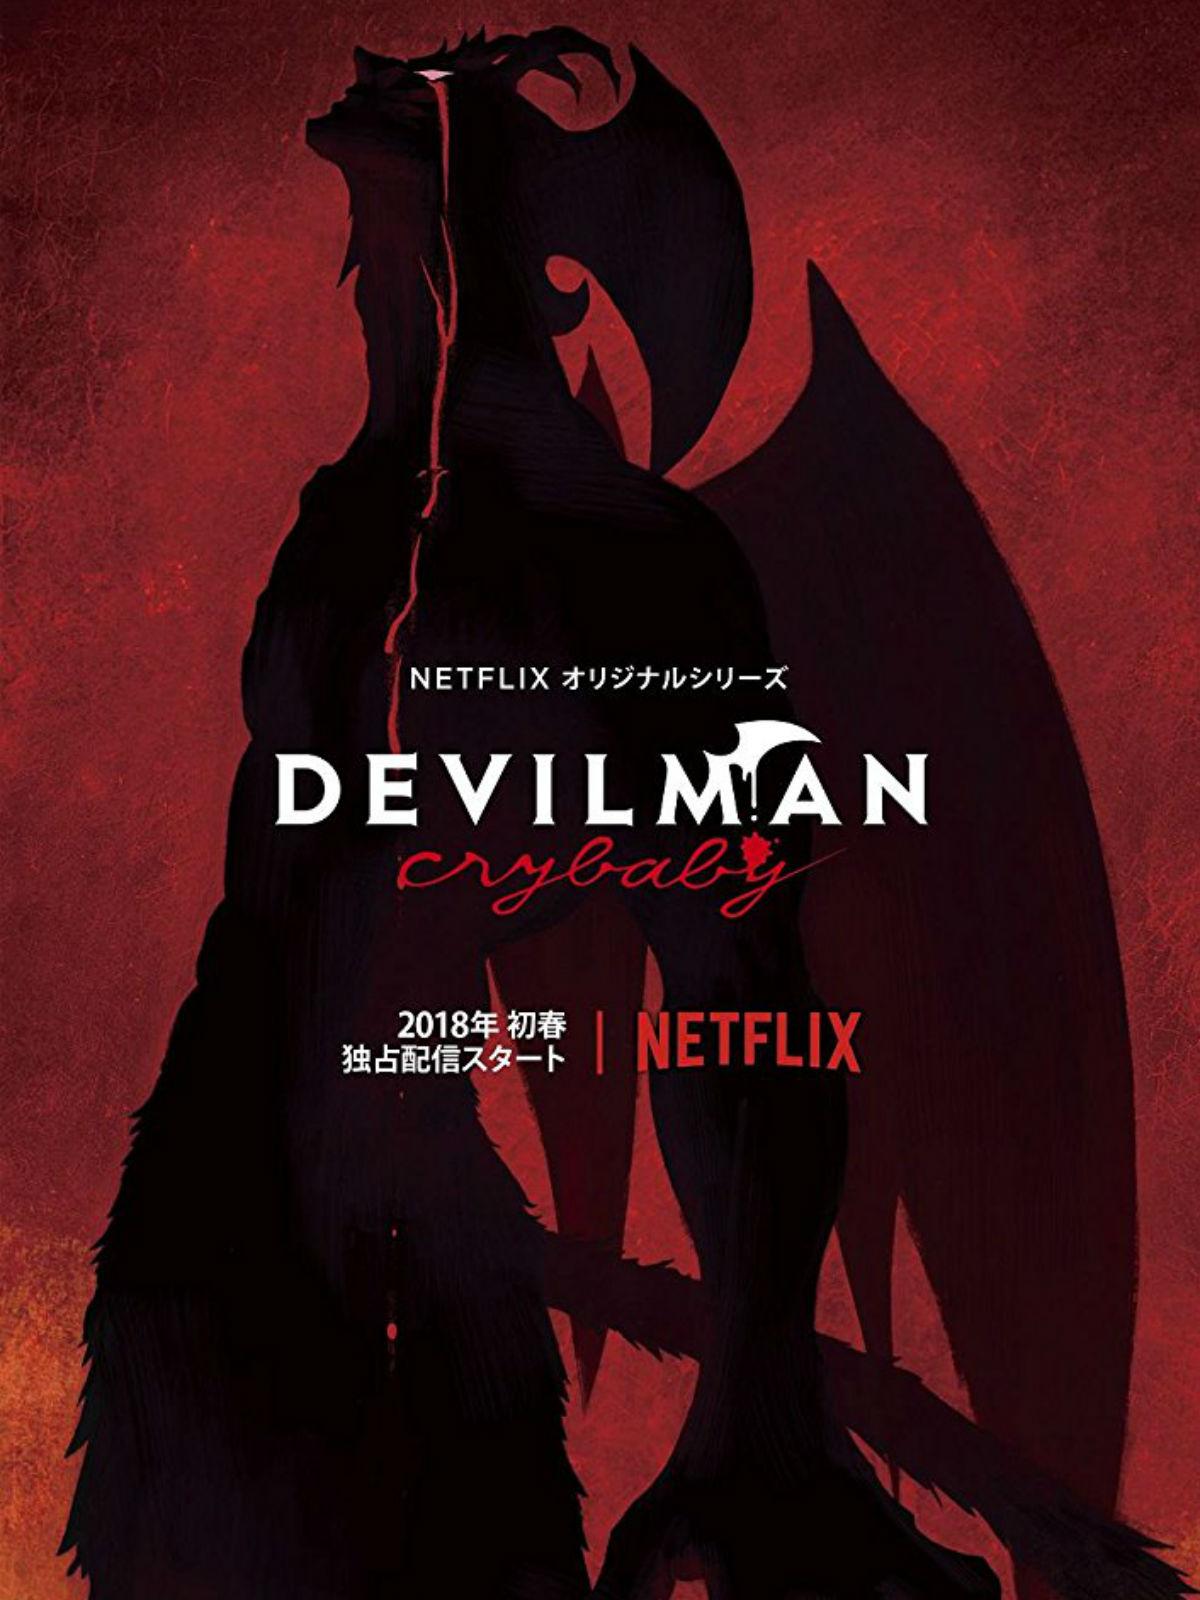 Anime Devil Wallpaper Devilman Crybaby Serie 2018 Sensacine Com